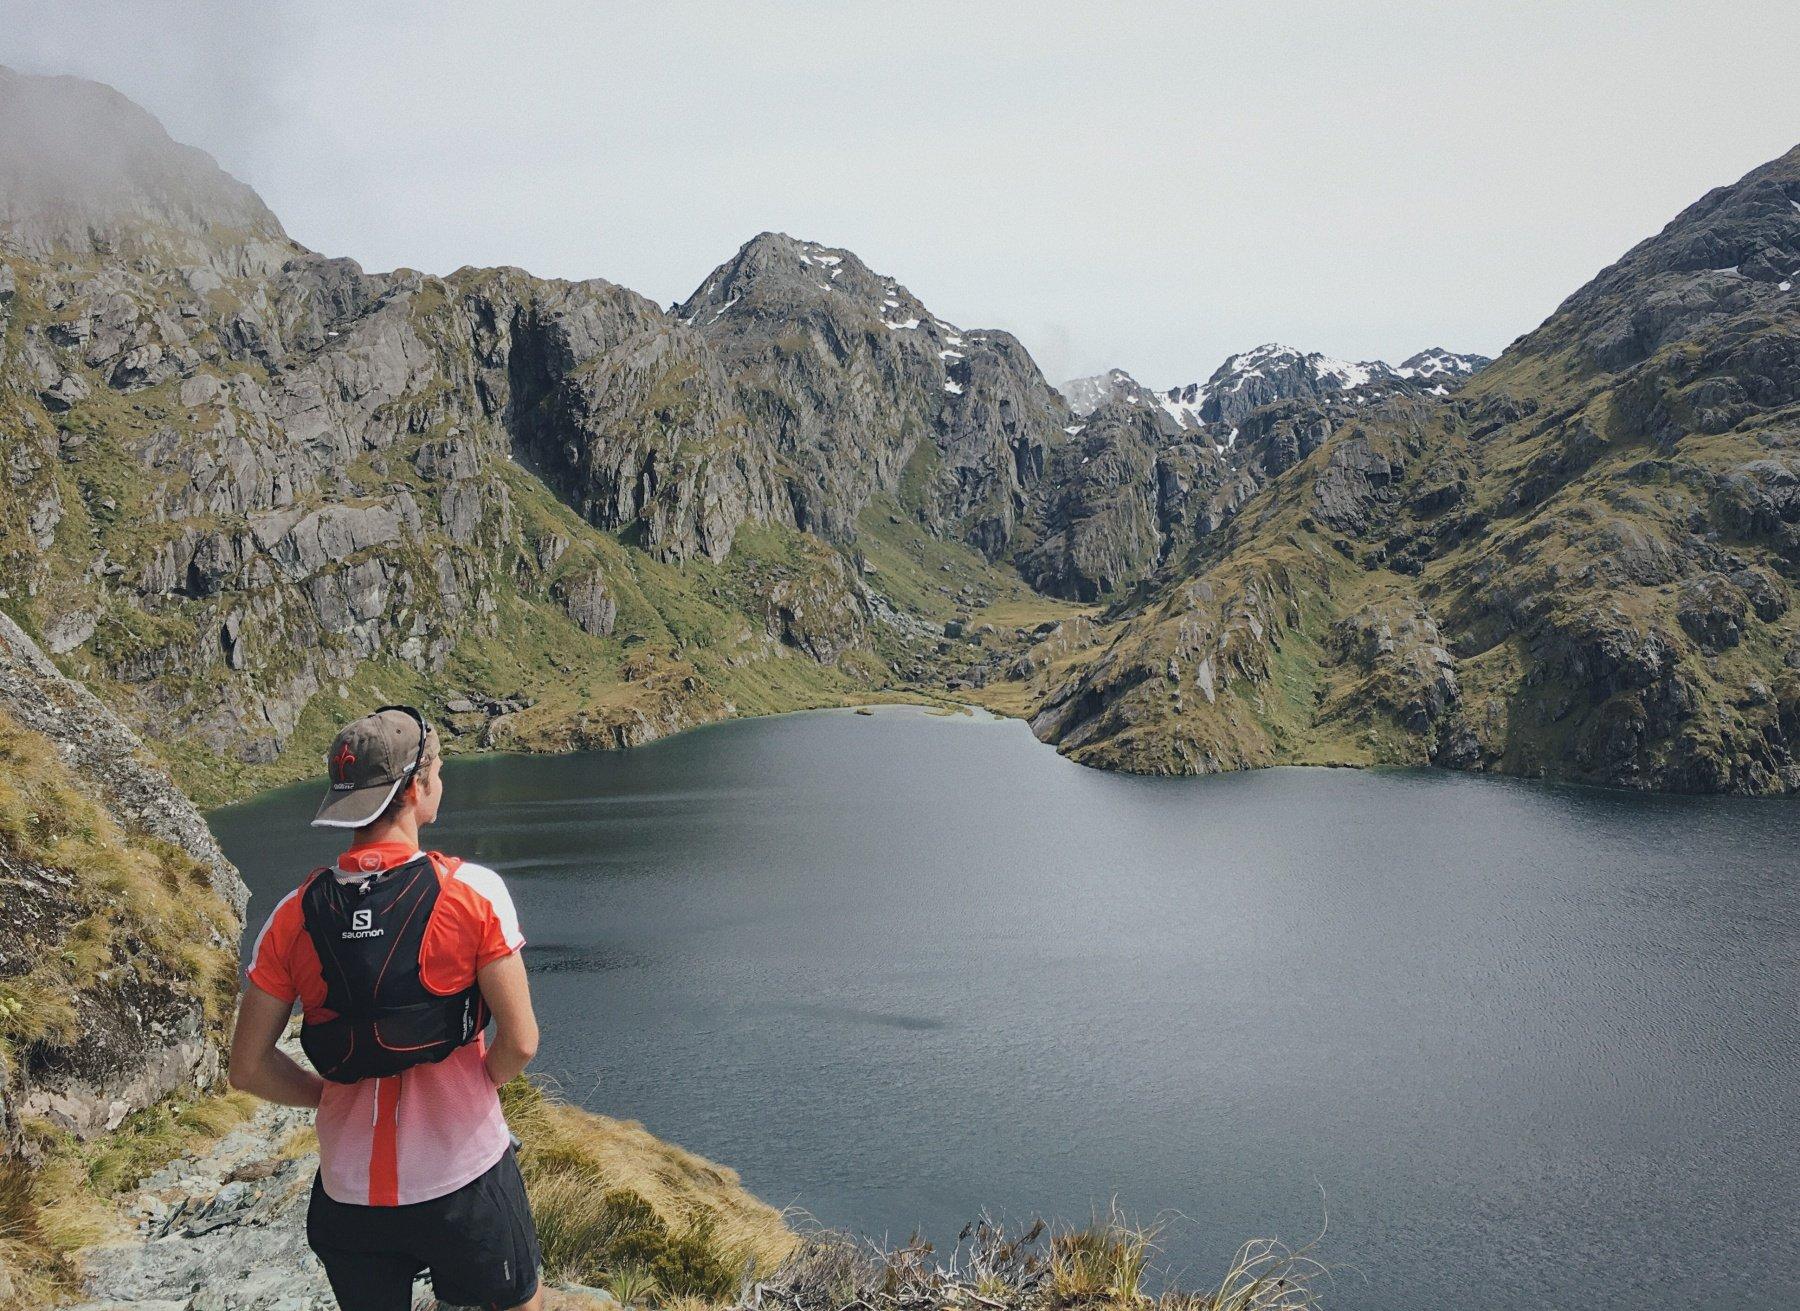 Running streak Trail and Kale